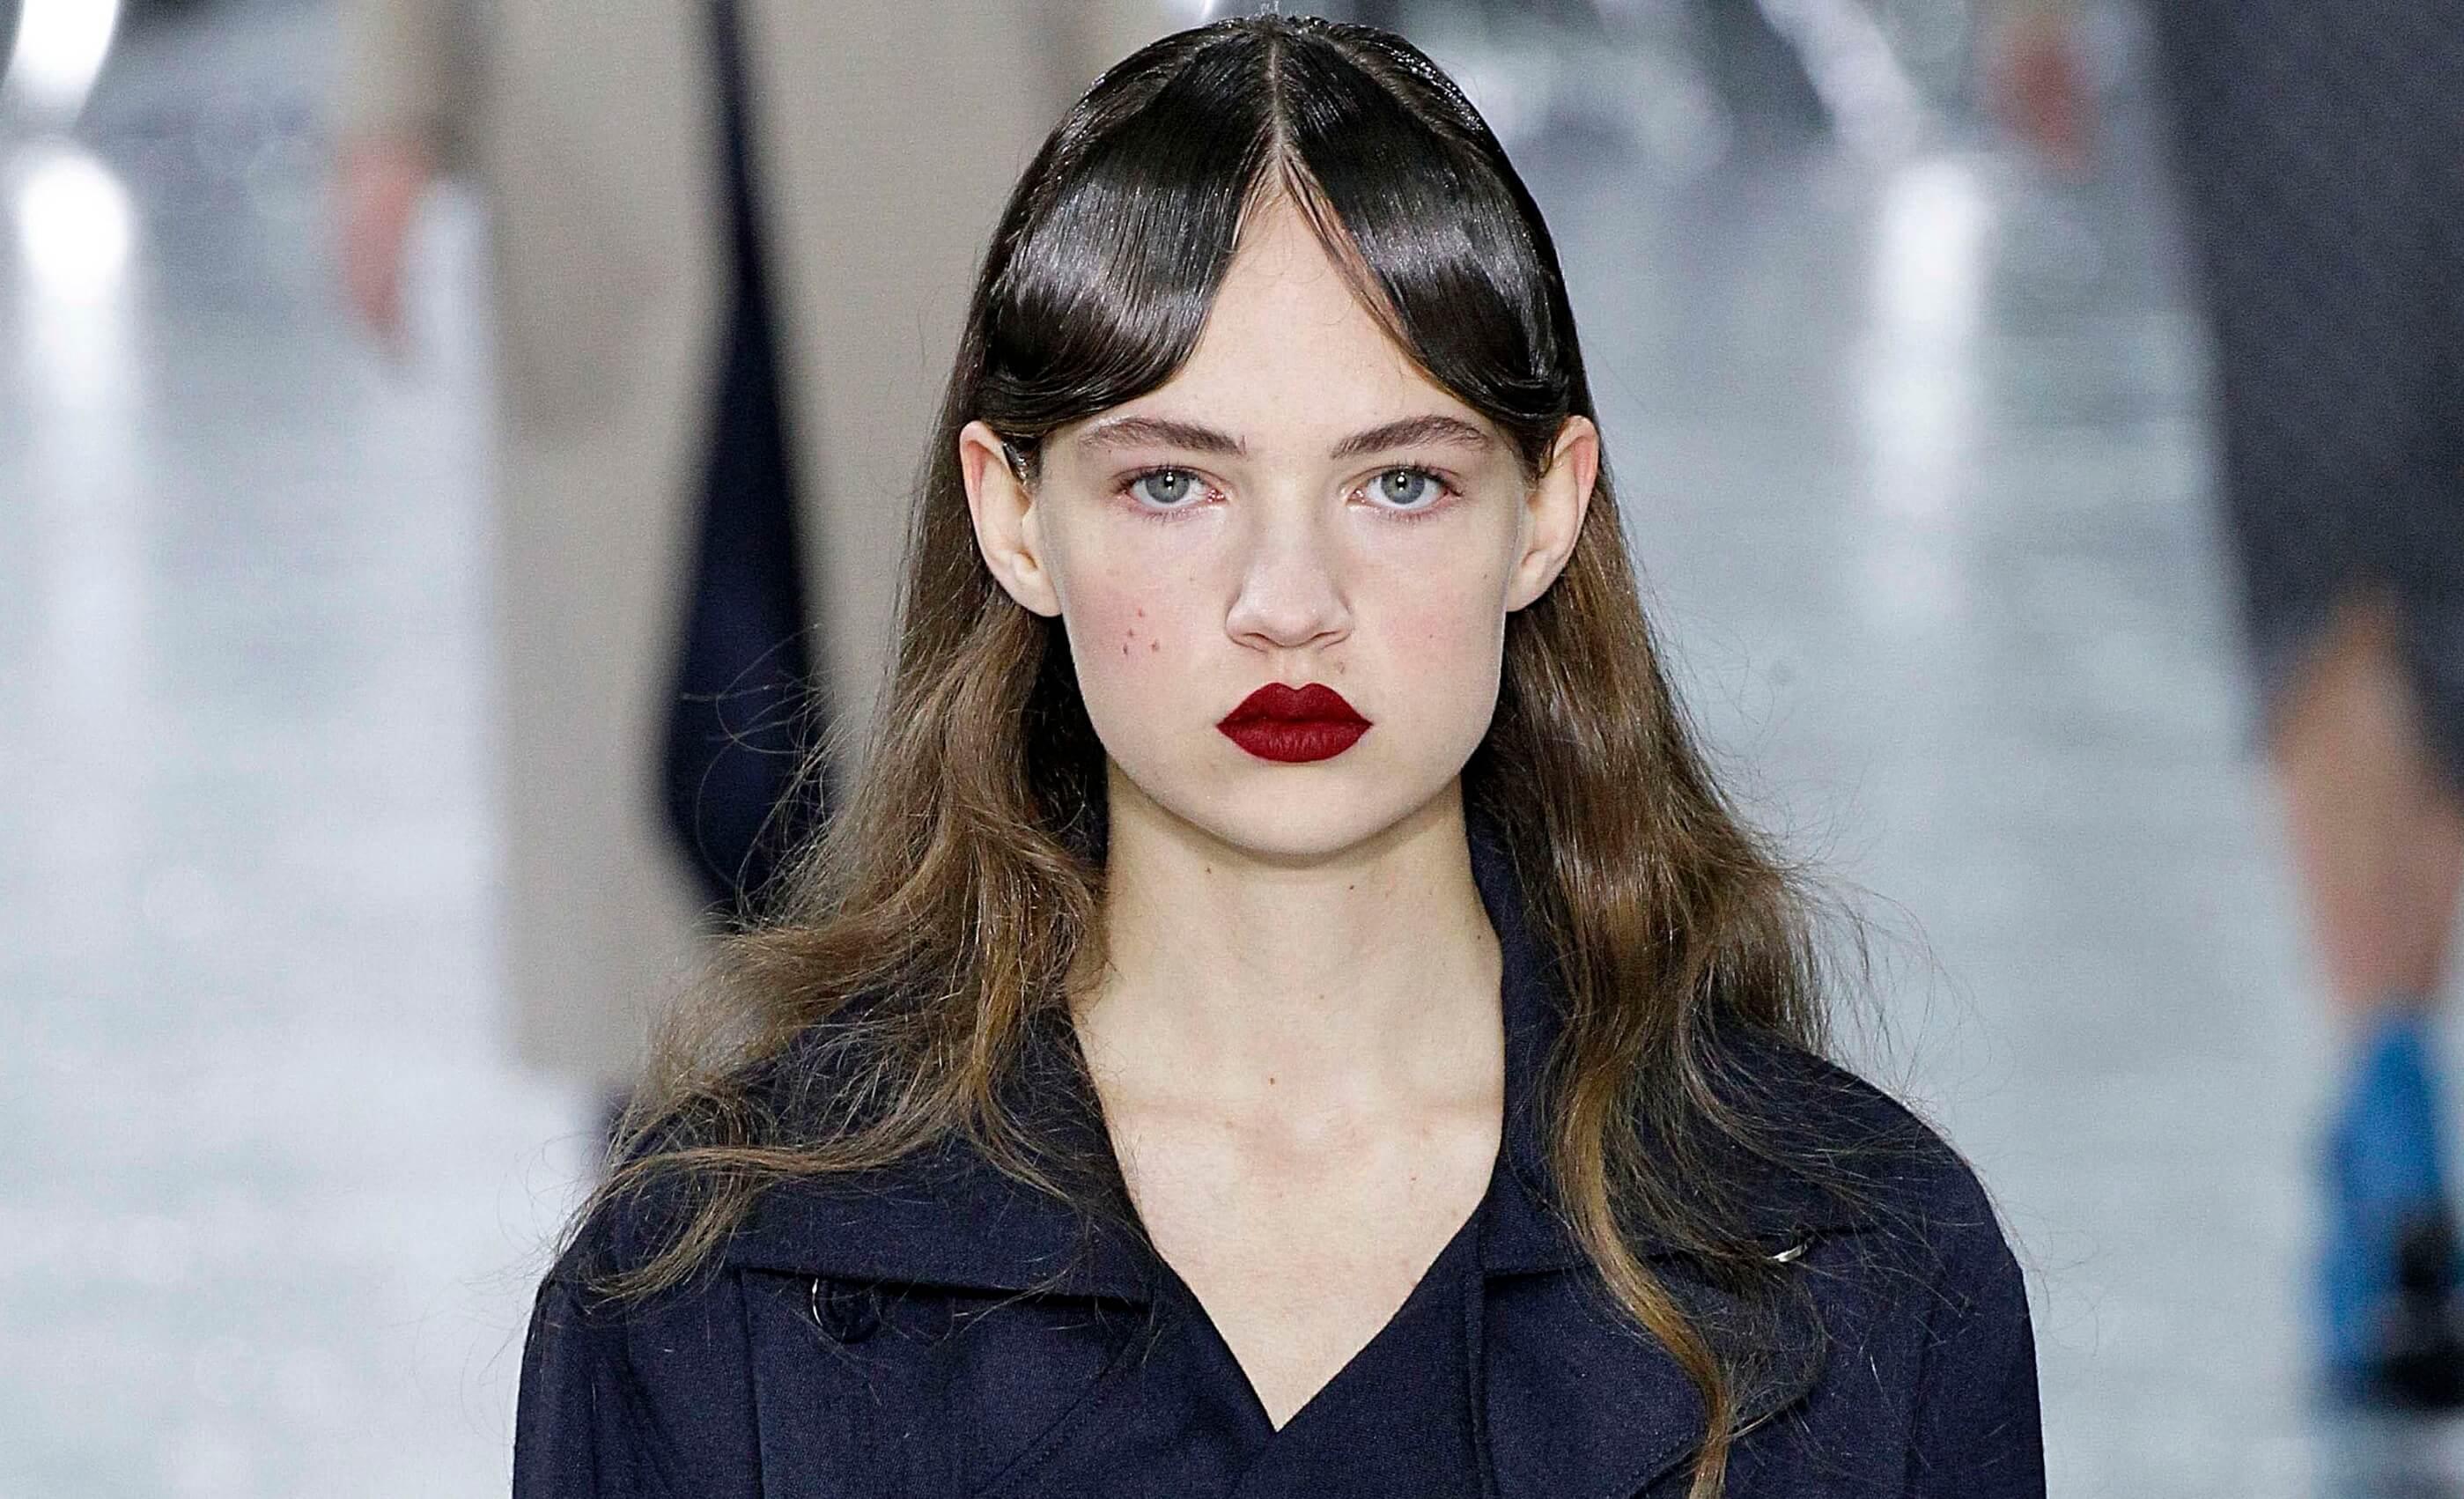 fringe aw16 runway latest hairstyles